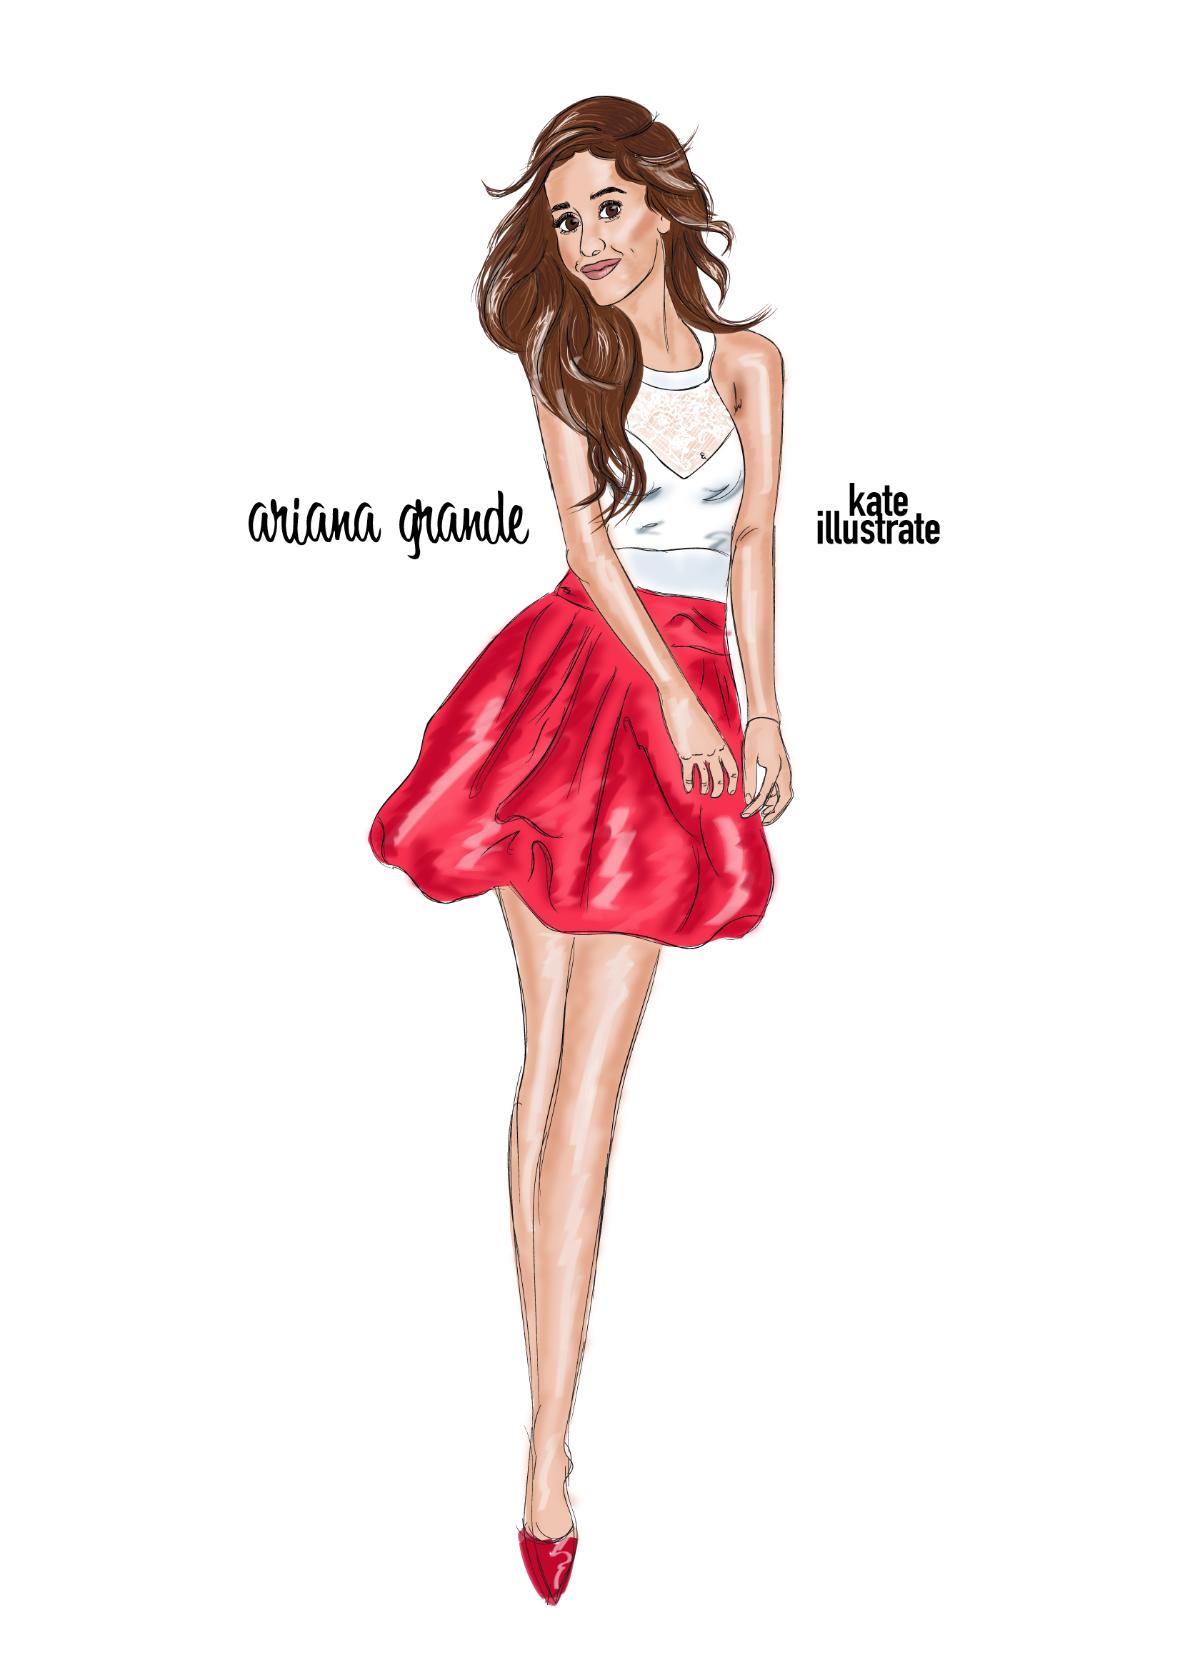 fashion-illustration-kateillustrate-ariana-grande